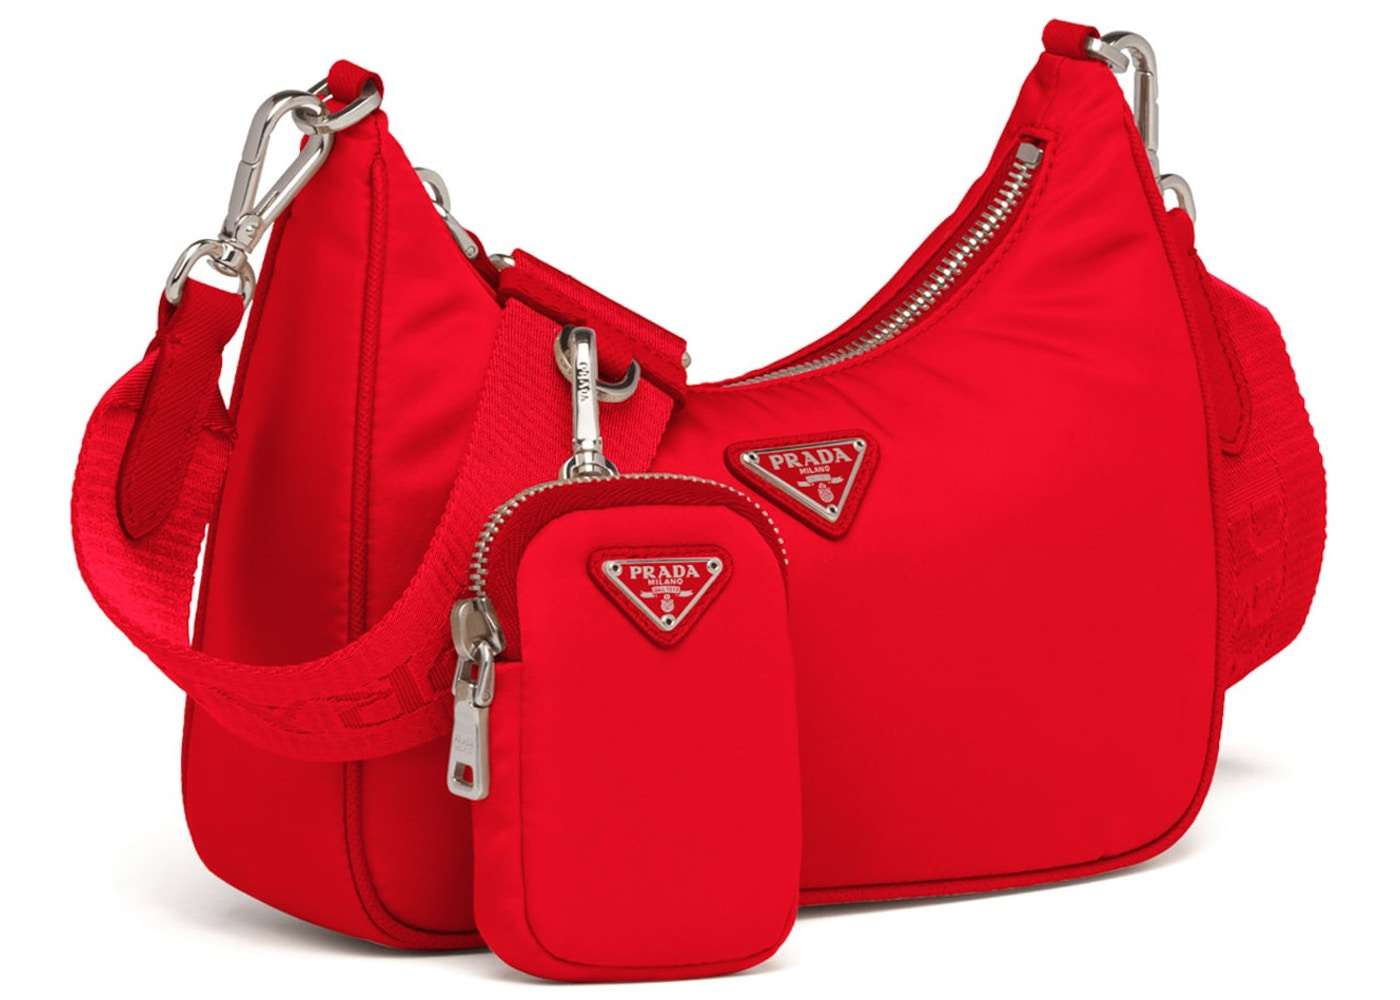 Prada Re Edition 2005 Shoulder Bag